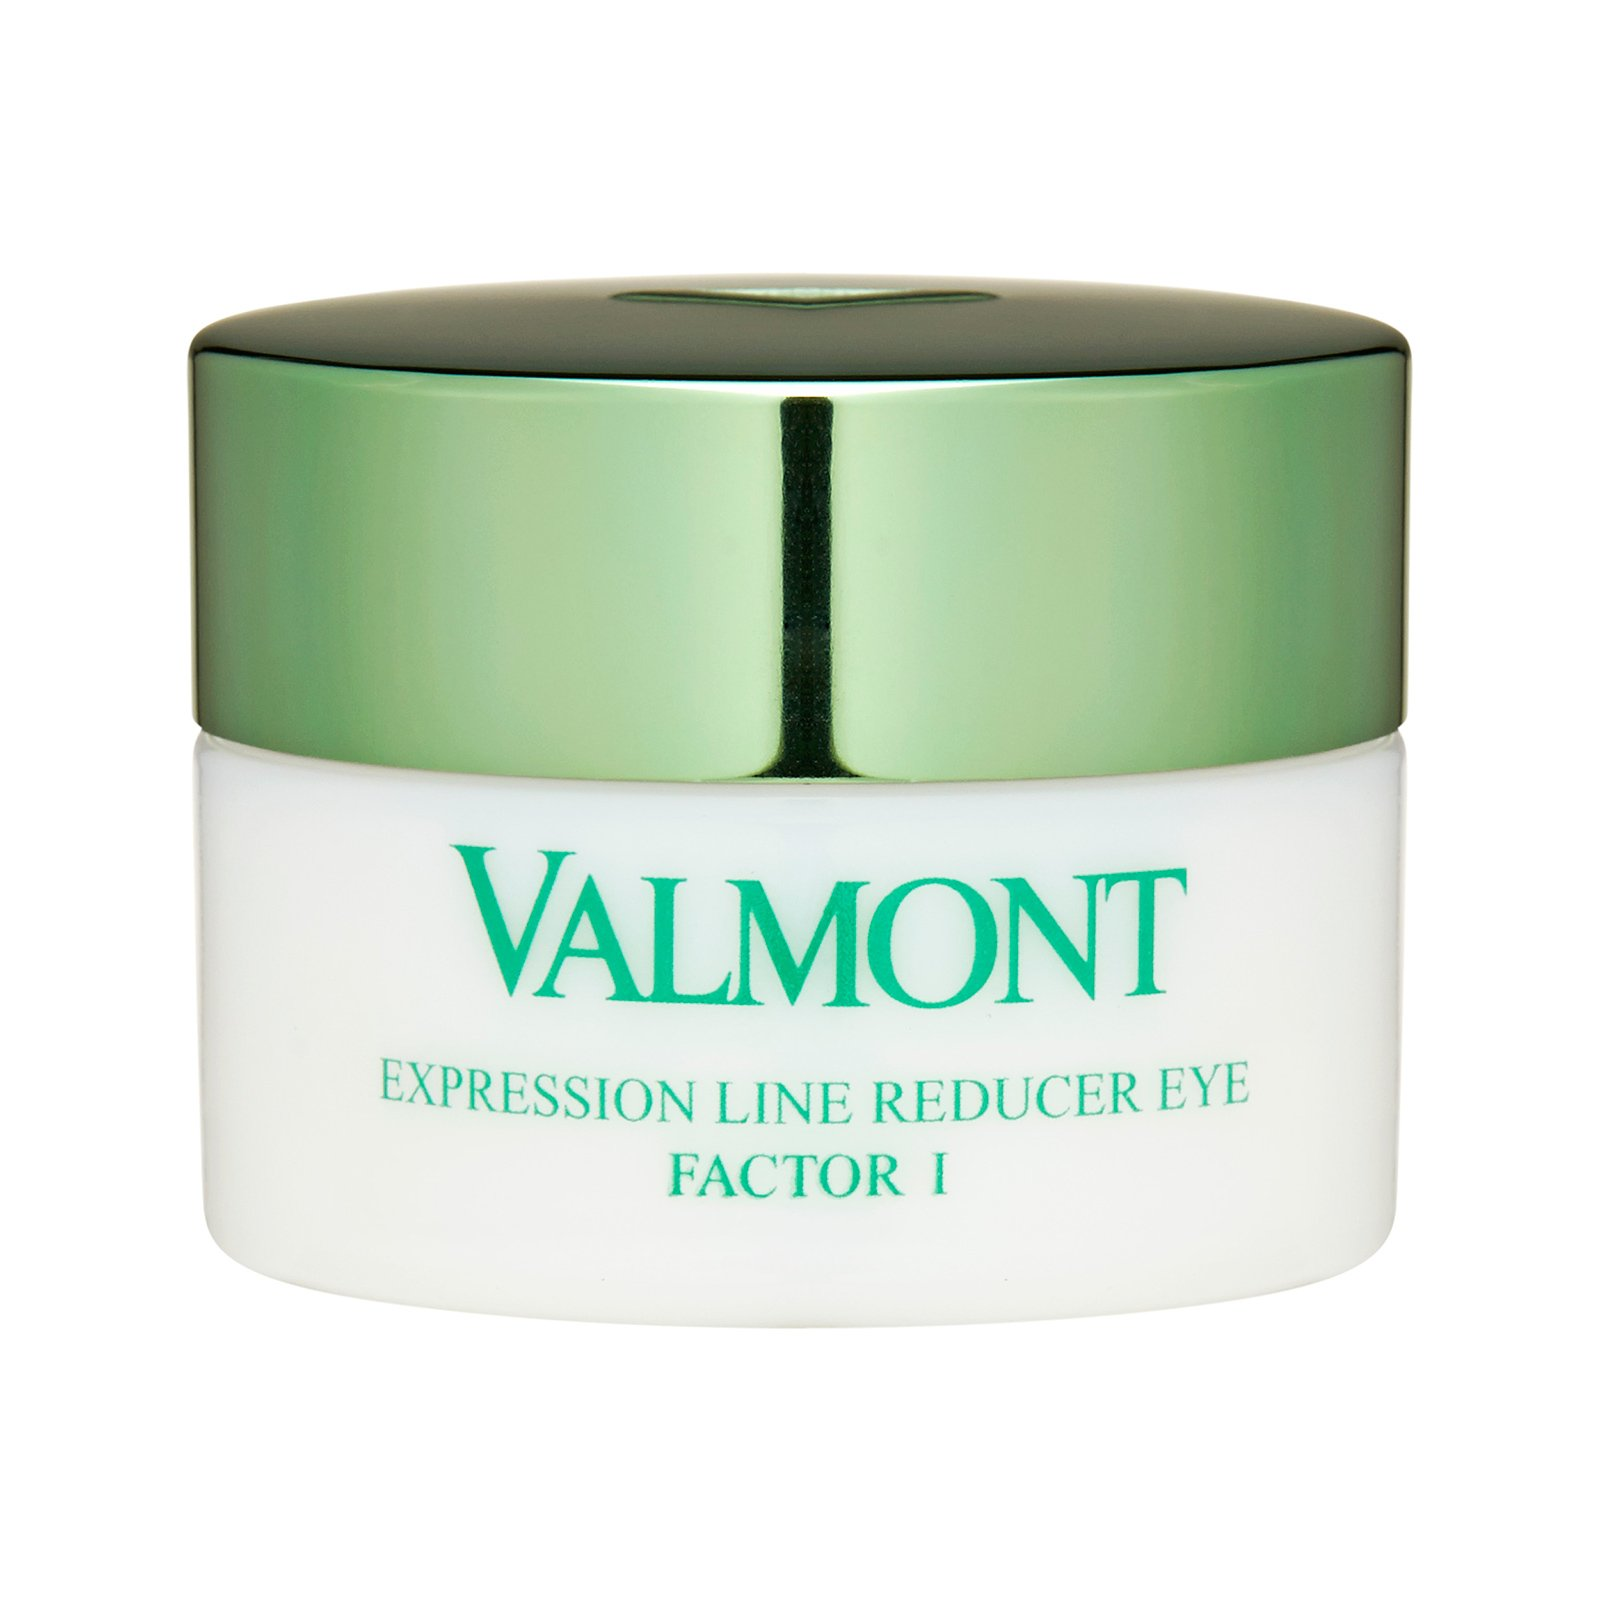 Valmont Eye Care 0.51 Oz Prime Awf Expression Line Reducer Eye Factor I For Women